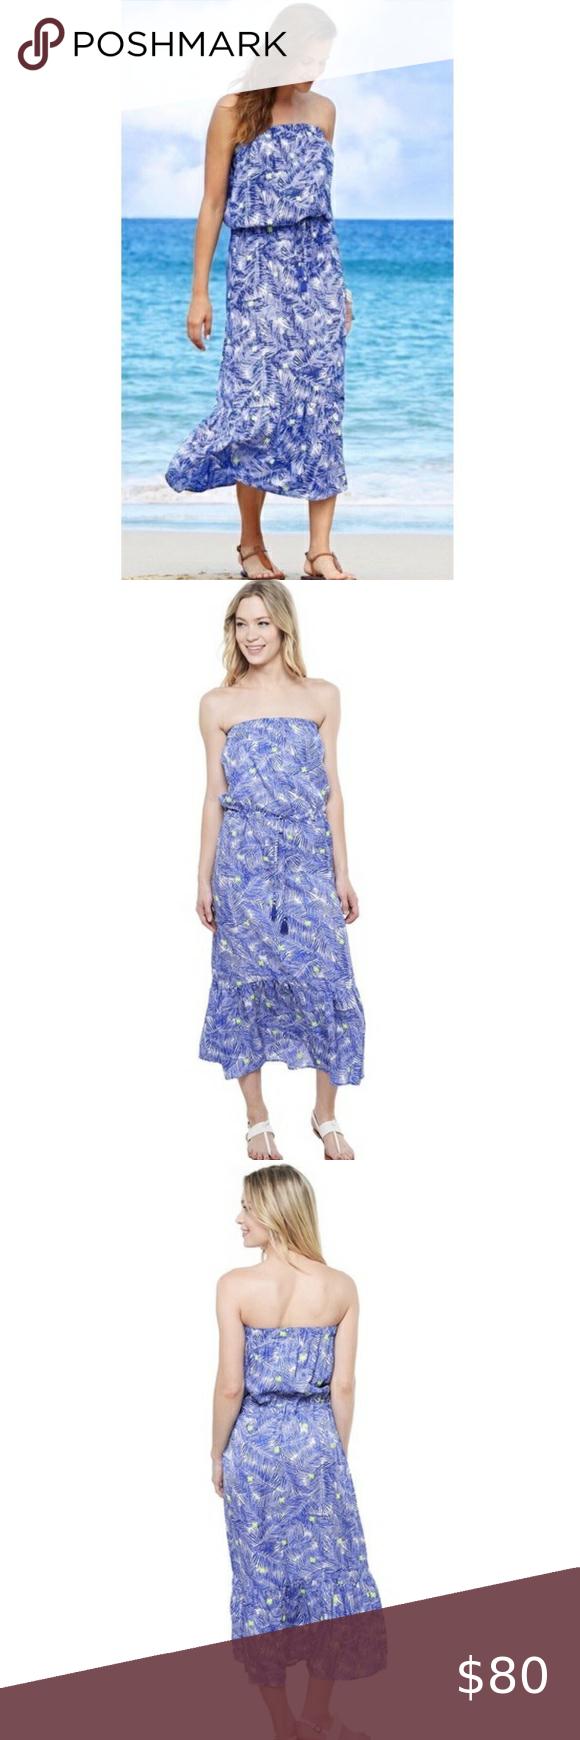 Vineyard Vines Palm Print Maxi Dress Sz M In 2020 Palm Print Maxi Printed Maxi Dress Dresses [ 1740 x 580 Pixel ]